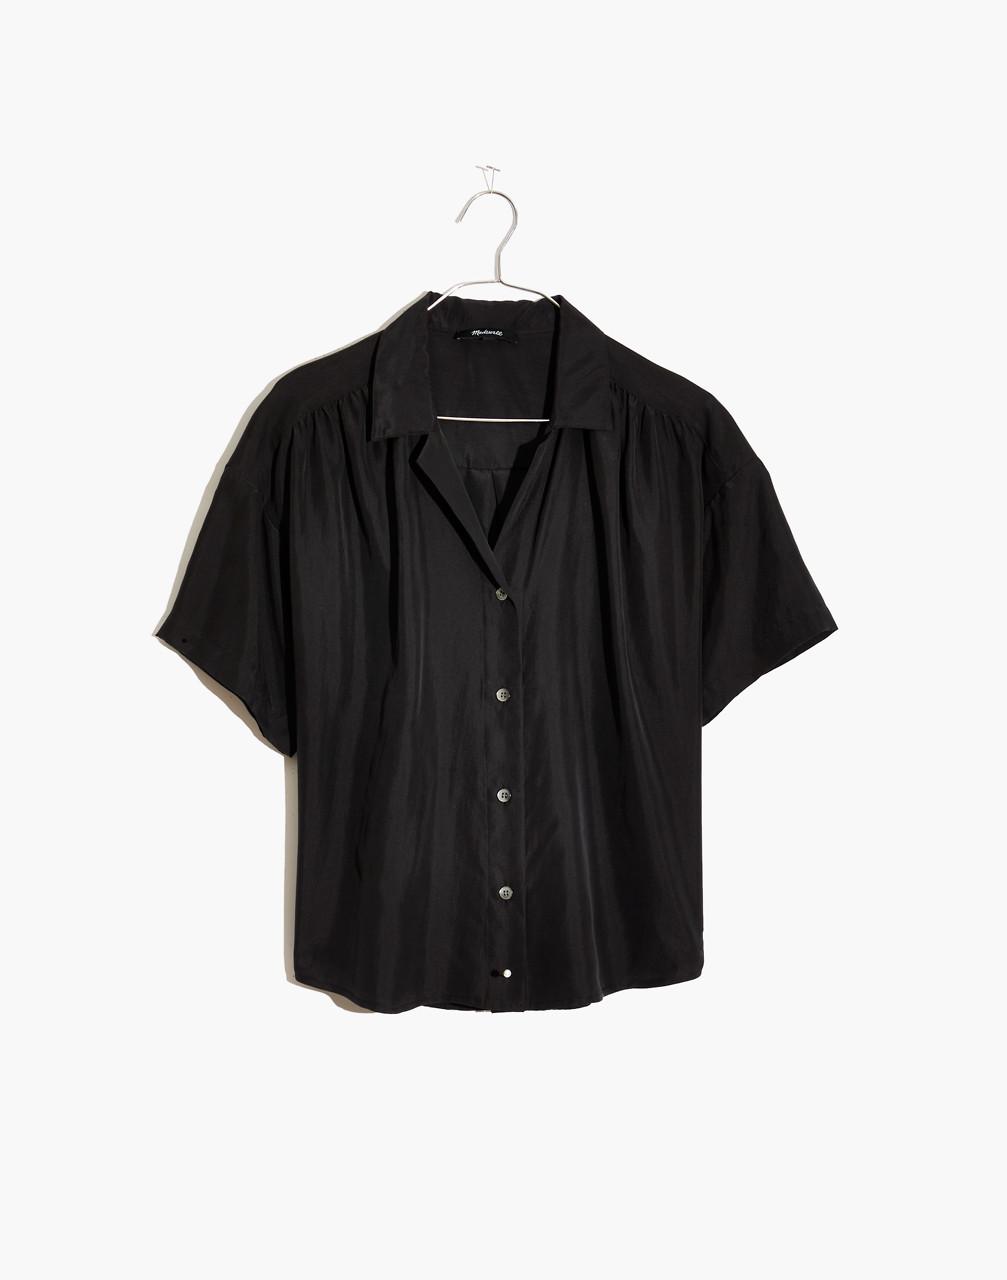 1940s Blouses, Shirts and Tops Fashion History Silk Camp Shirt $110.00 AT vintagedancer.com